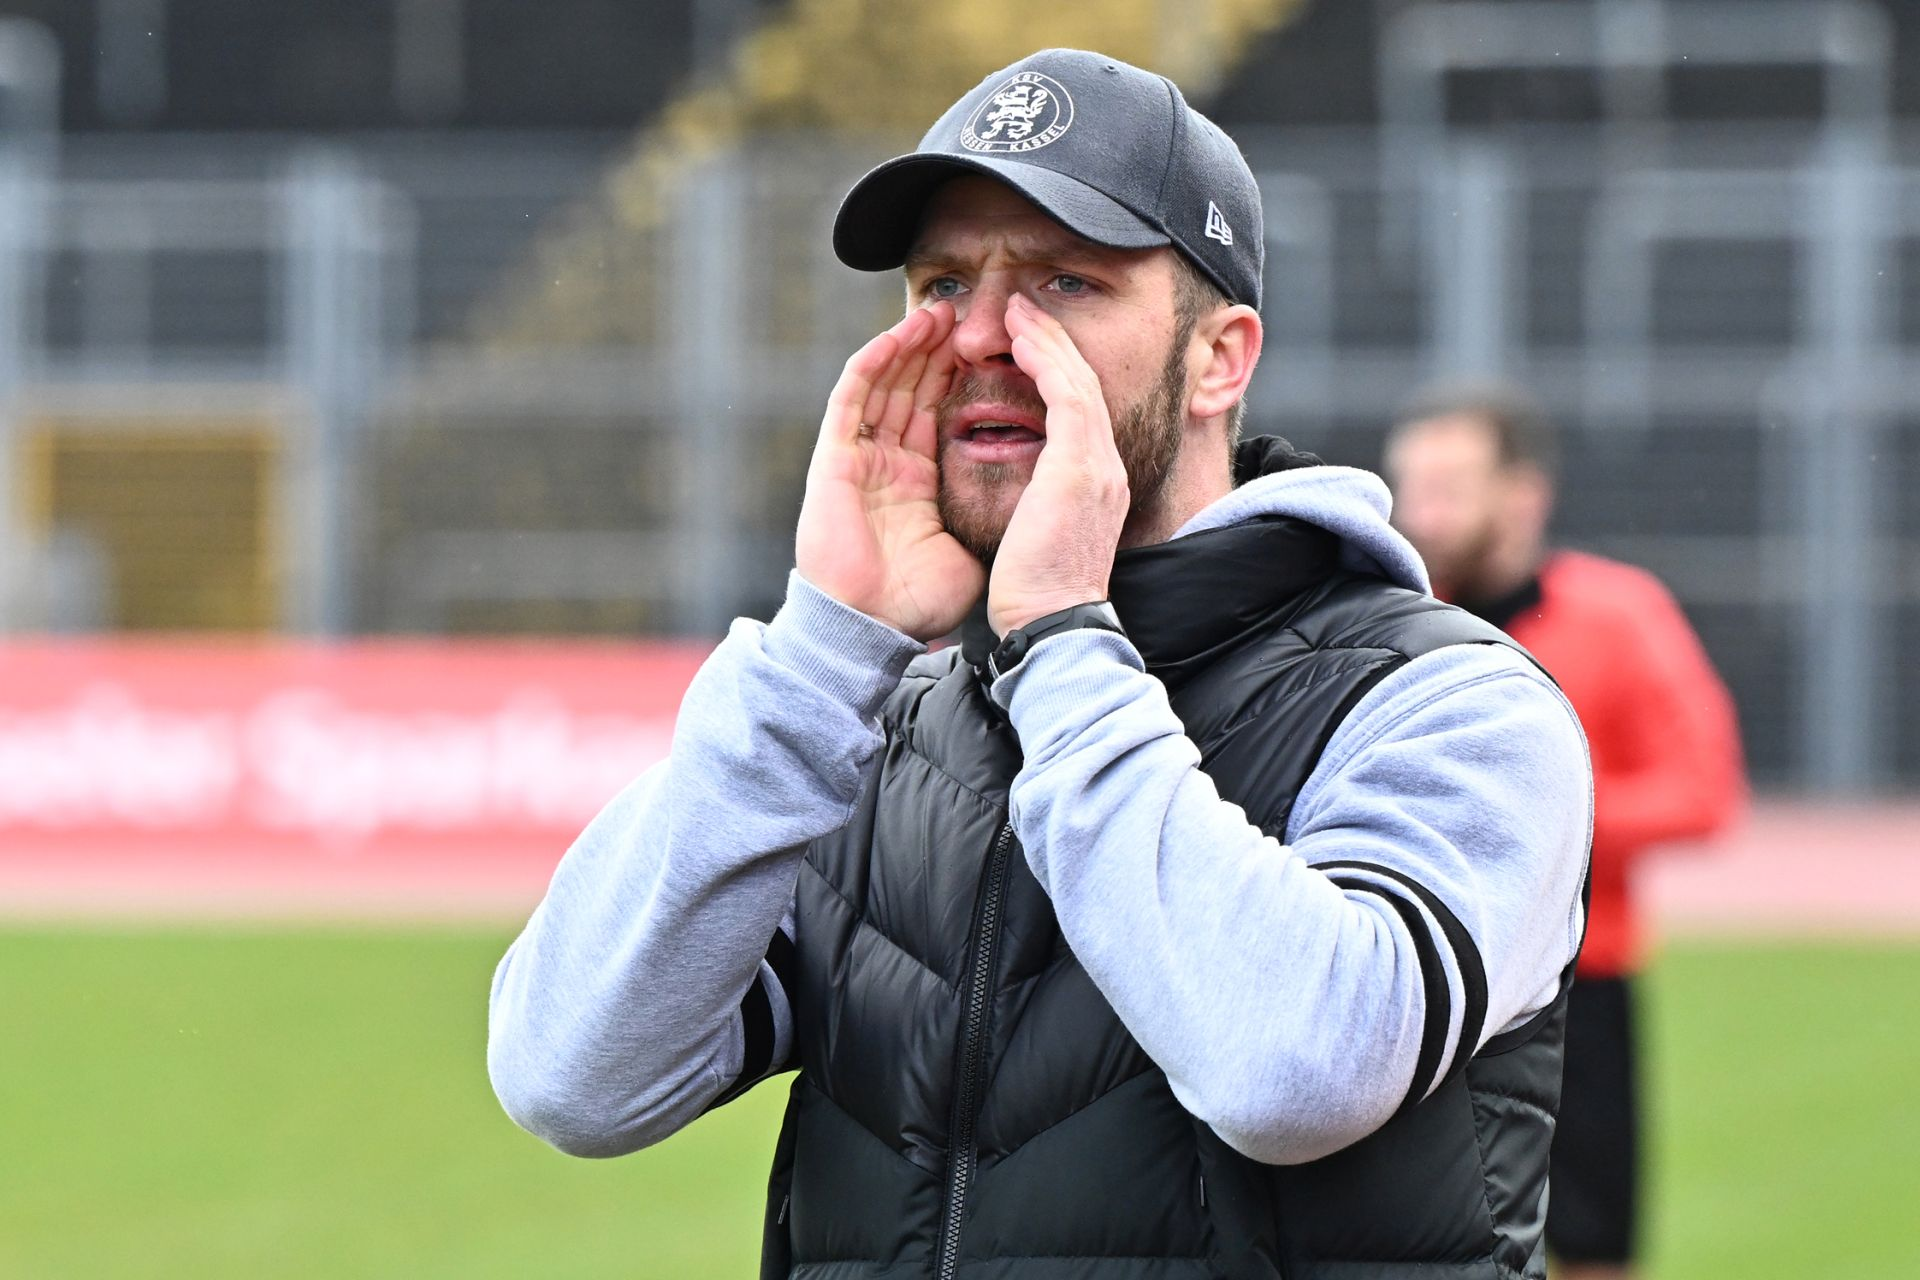 Regionalliga Südwest 2020/21, KSV Hessen Kassel, FSV Frankfurt, Endstand 2:1, Tobias Damm